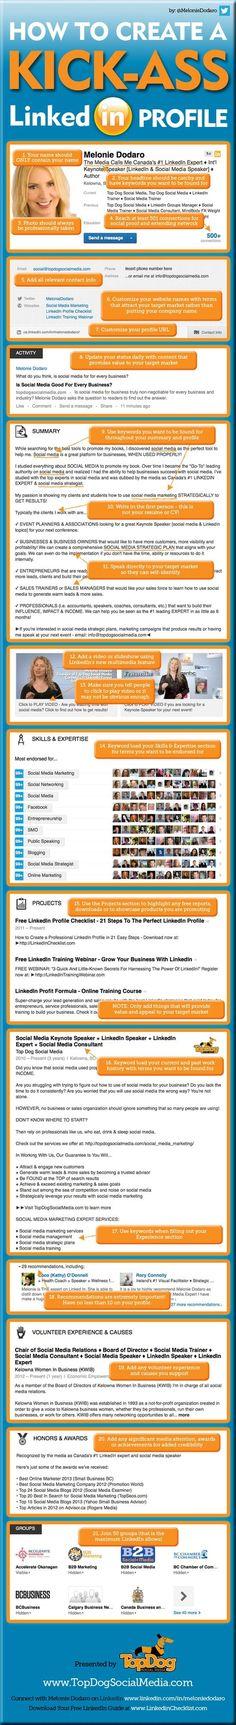 Kickin' booty! Create an awesome LinkedIn Profile #infographic